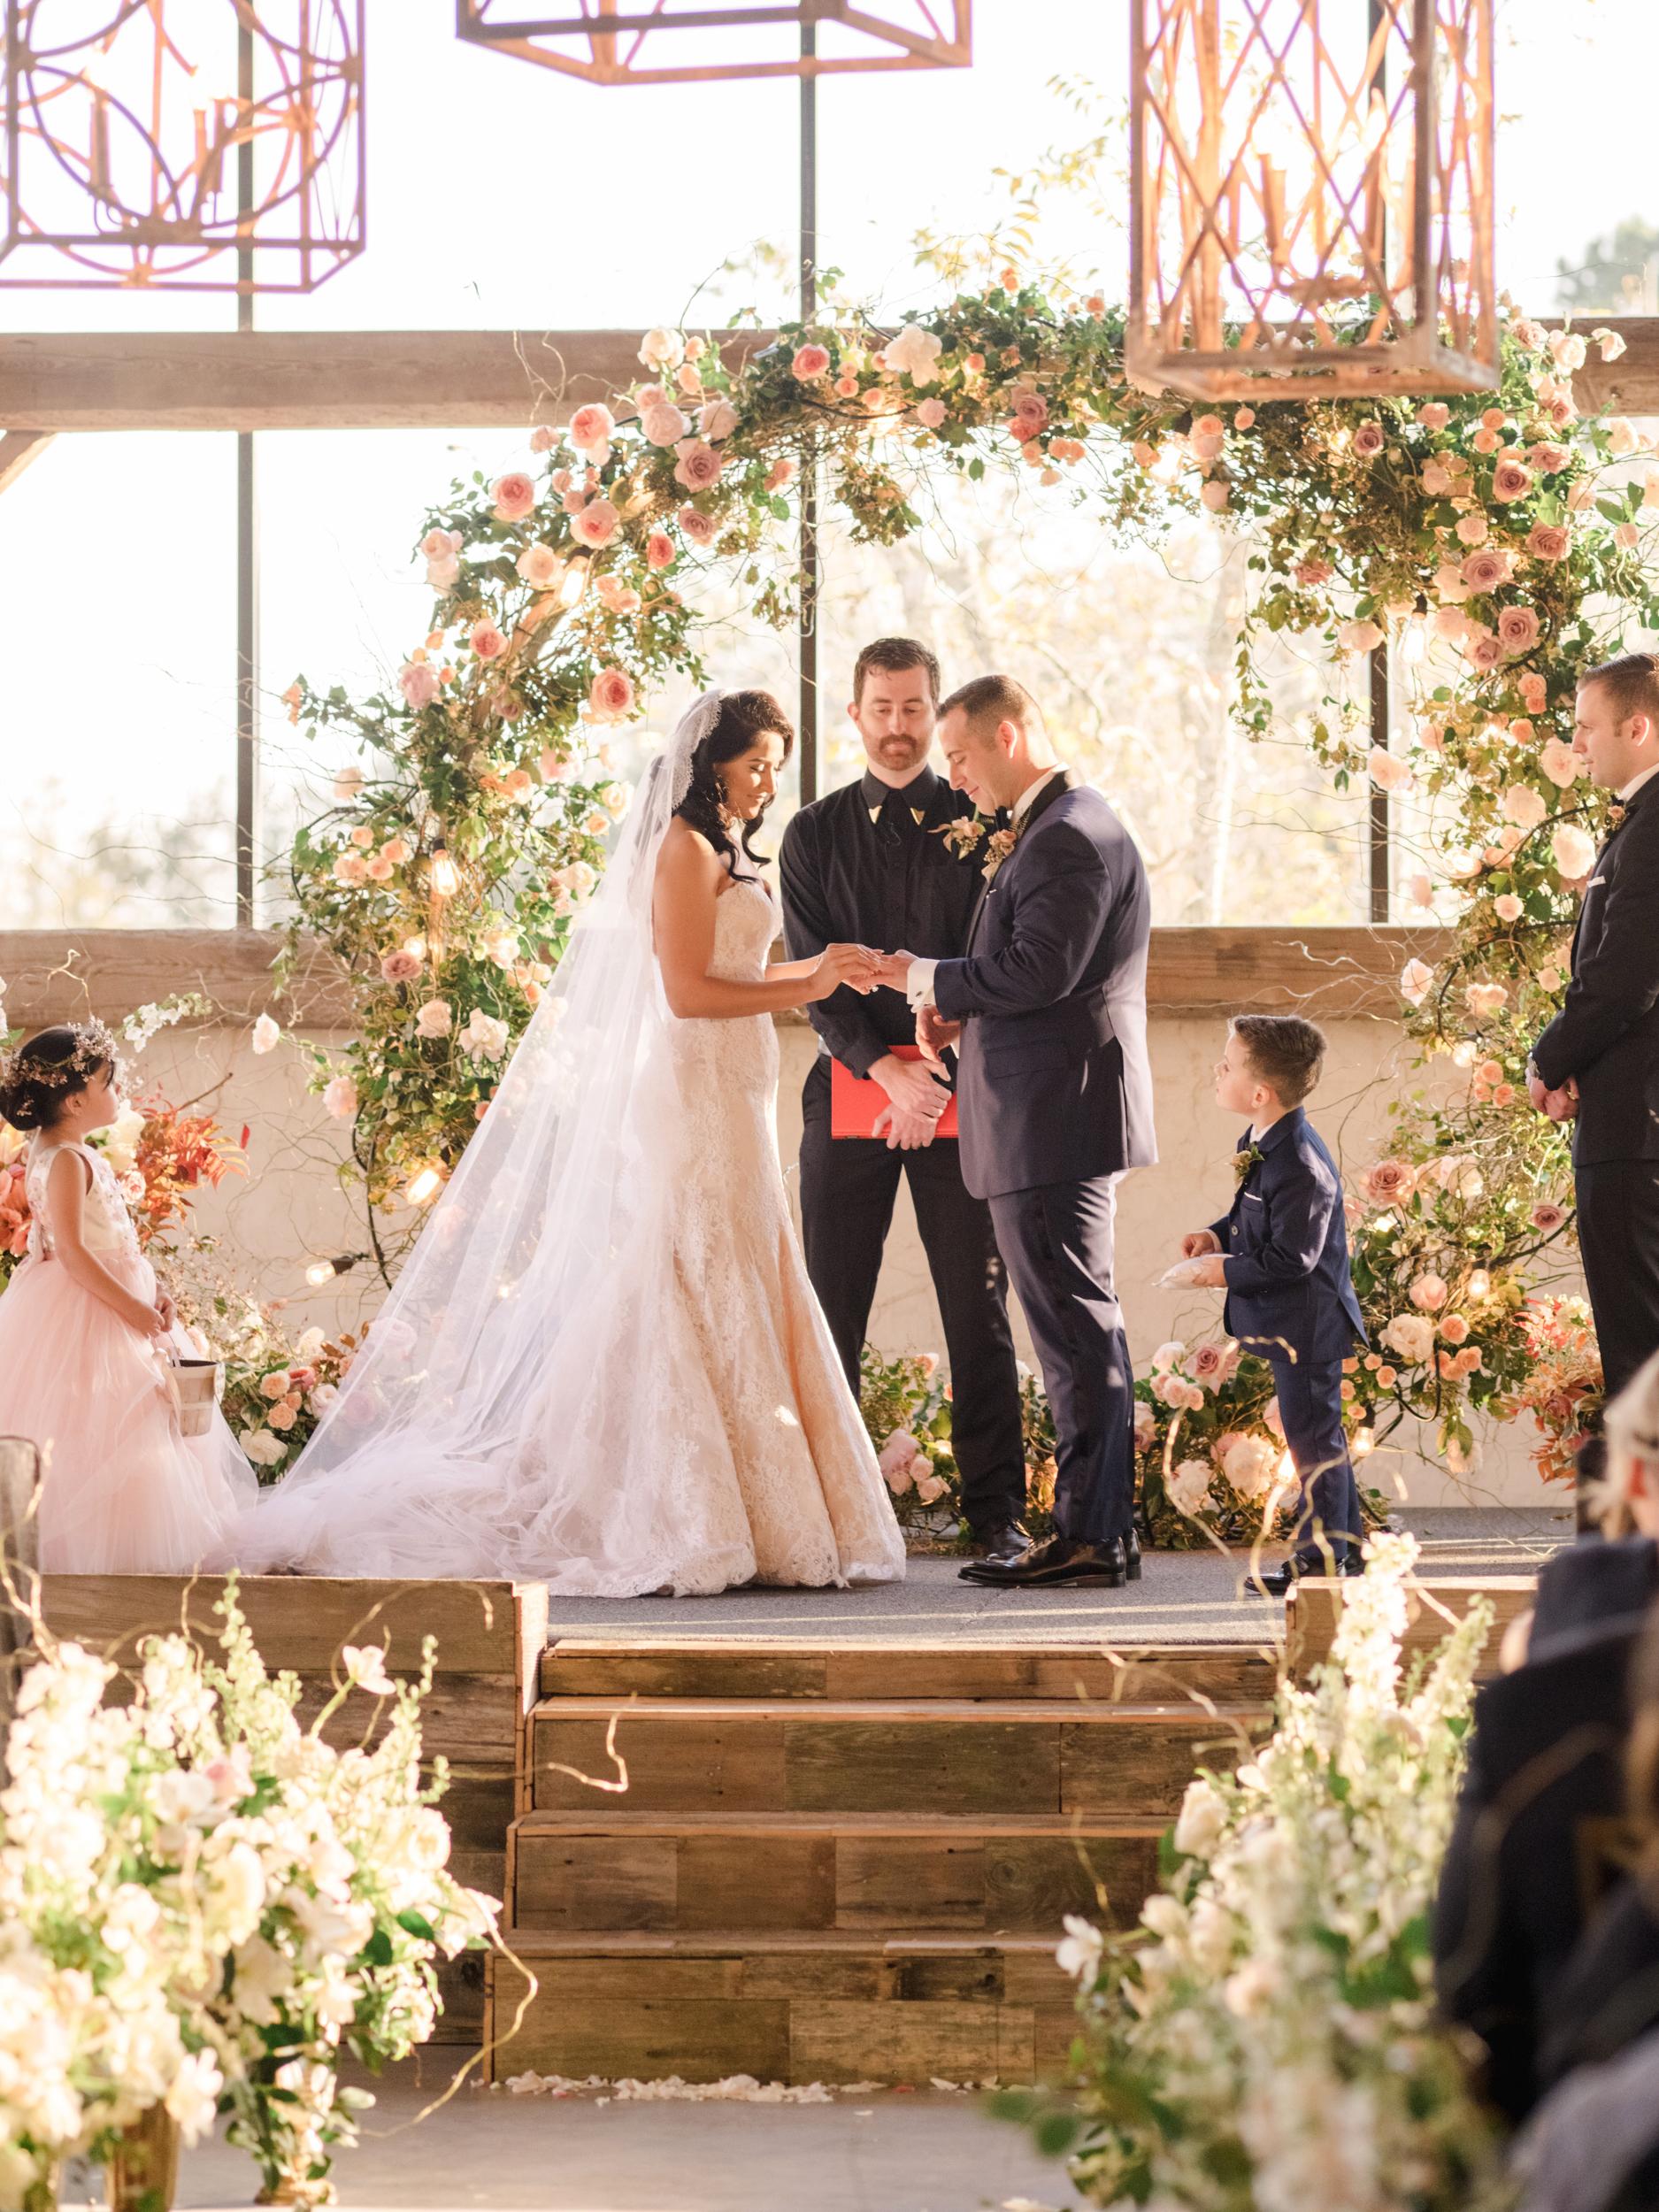 suzanne joseph wedding ceremony corbin gurkin